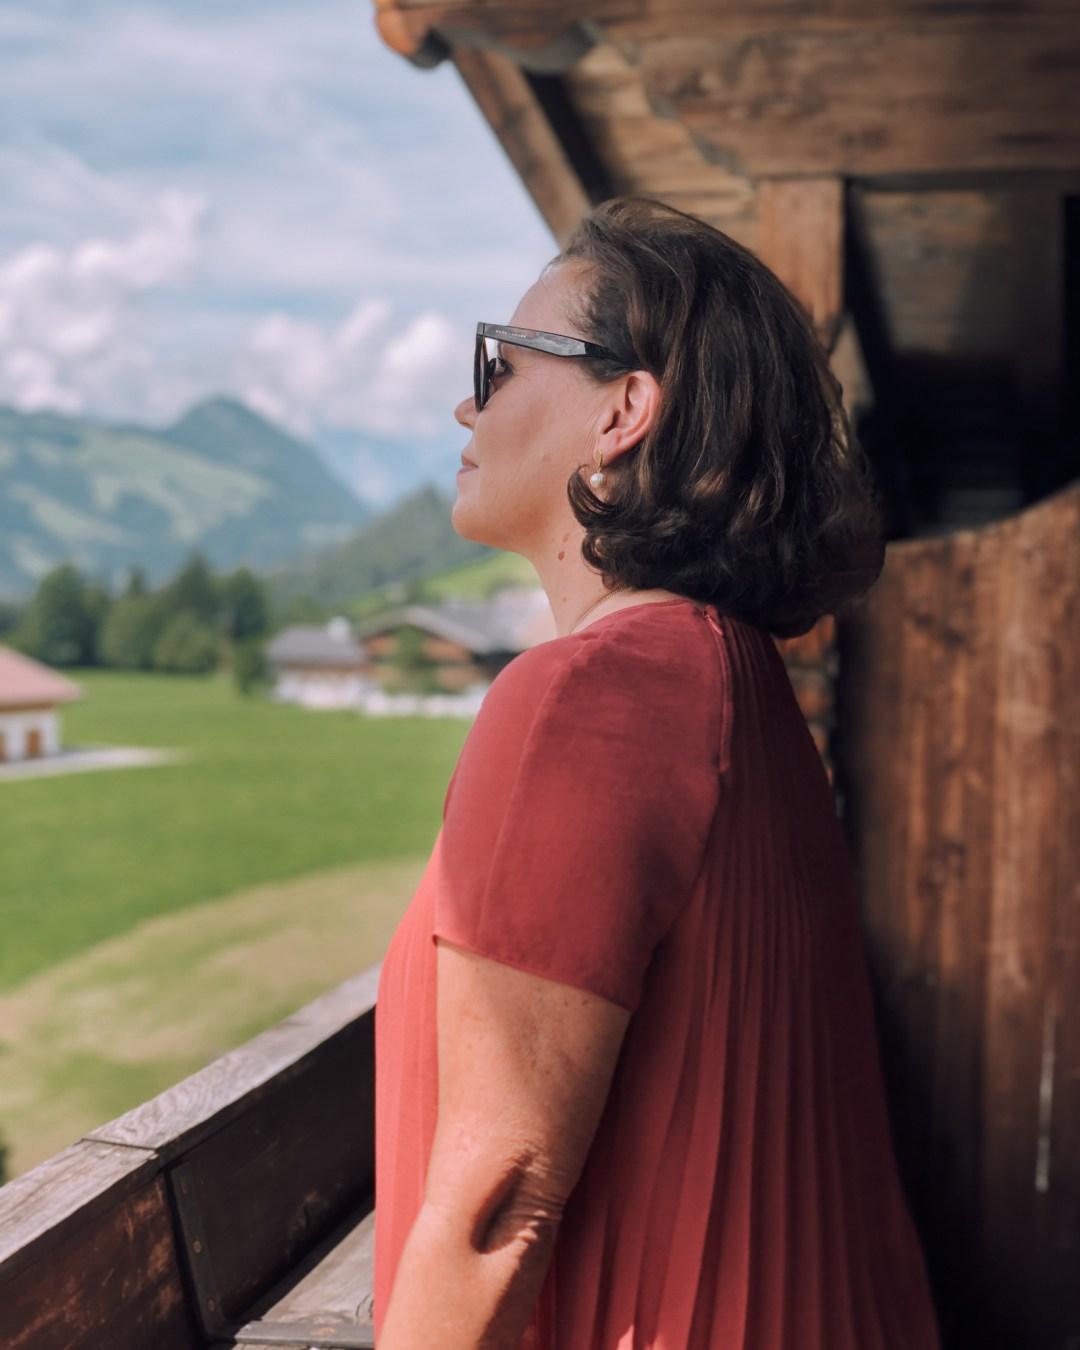 inastil, over50blogger, Alpbach, Alpbacherhof, Tirol, Austria, Visittirol, Wandern, Mountainbike, travelblogger, traveldiary, Urlaub, Urlaubinösterreich-7